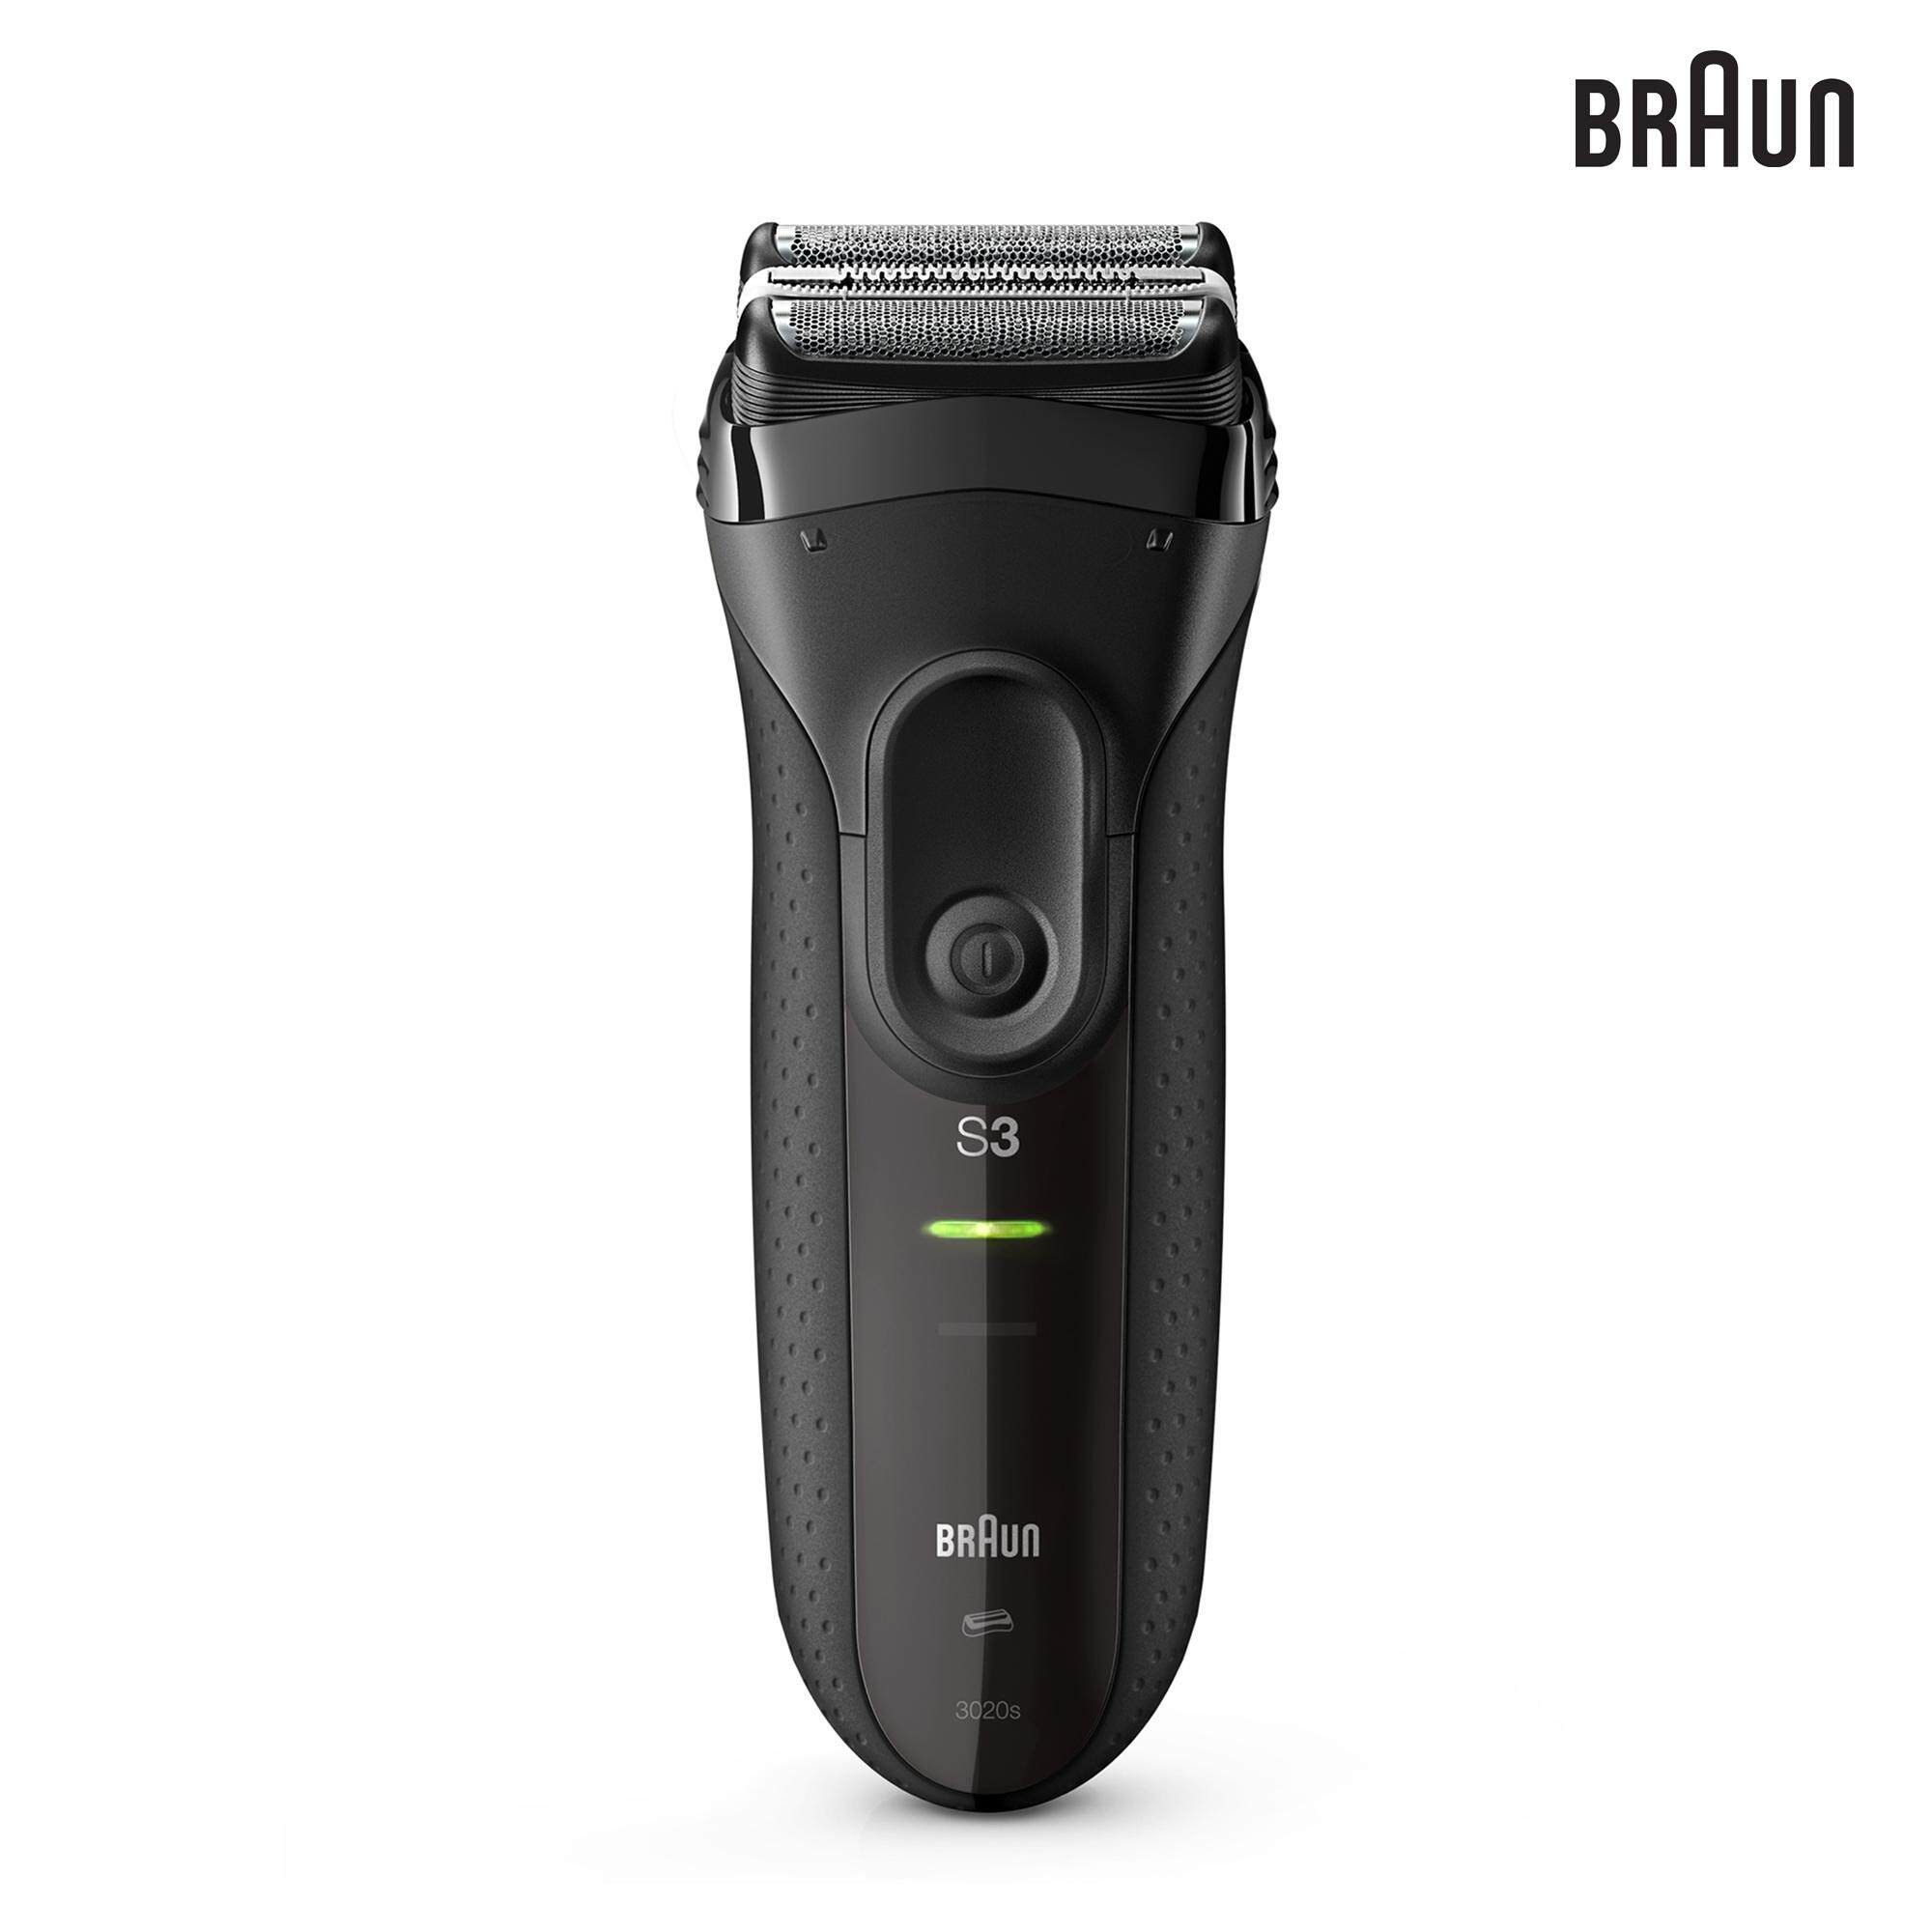 Braun Series 3 ProSkin 3020s Shaver